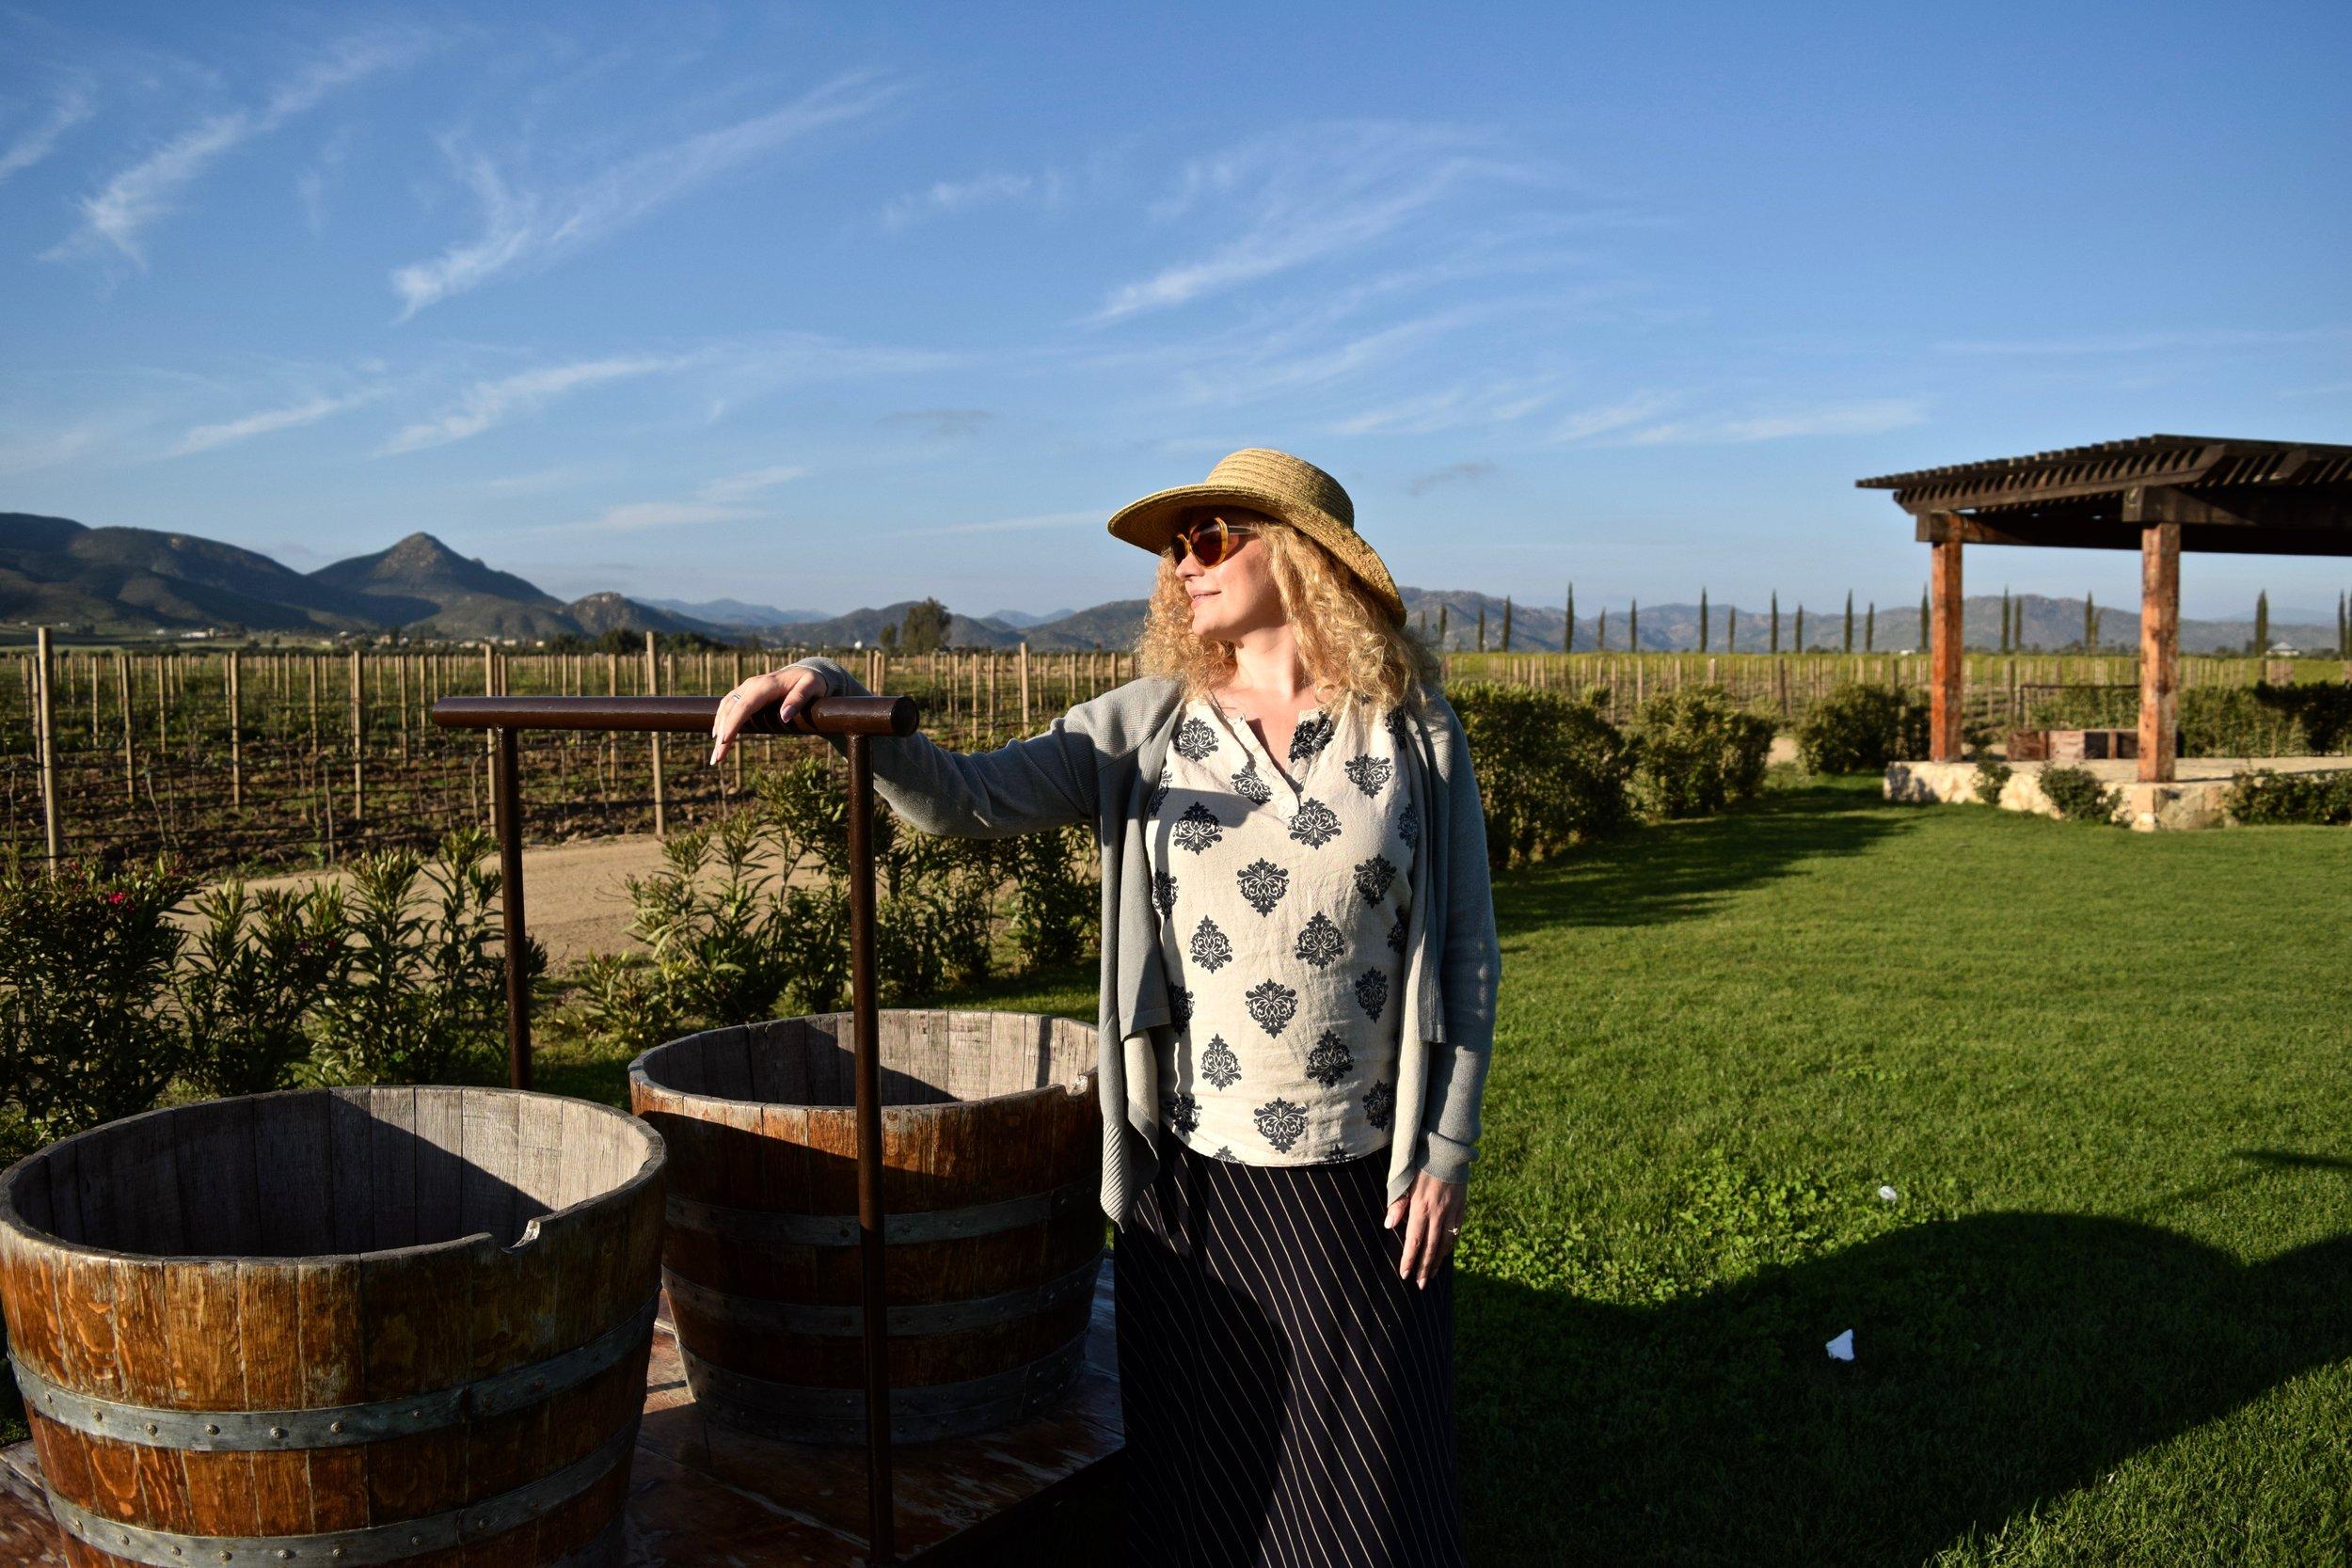 el cielo- joanna near half wine barrels.jpg